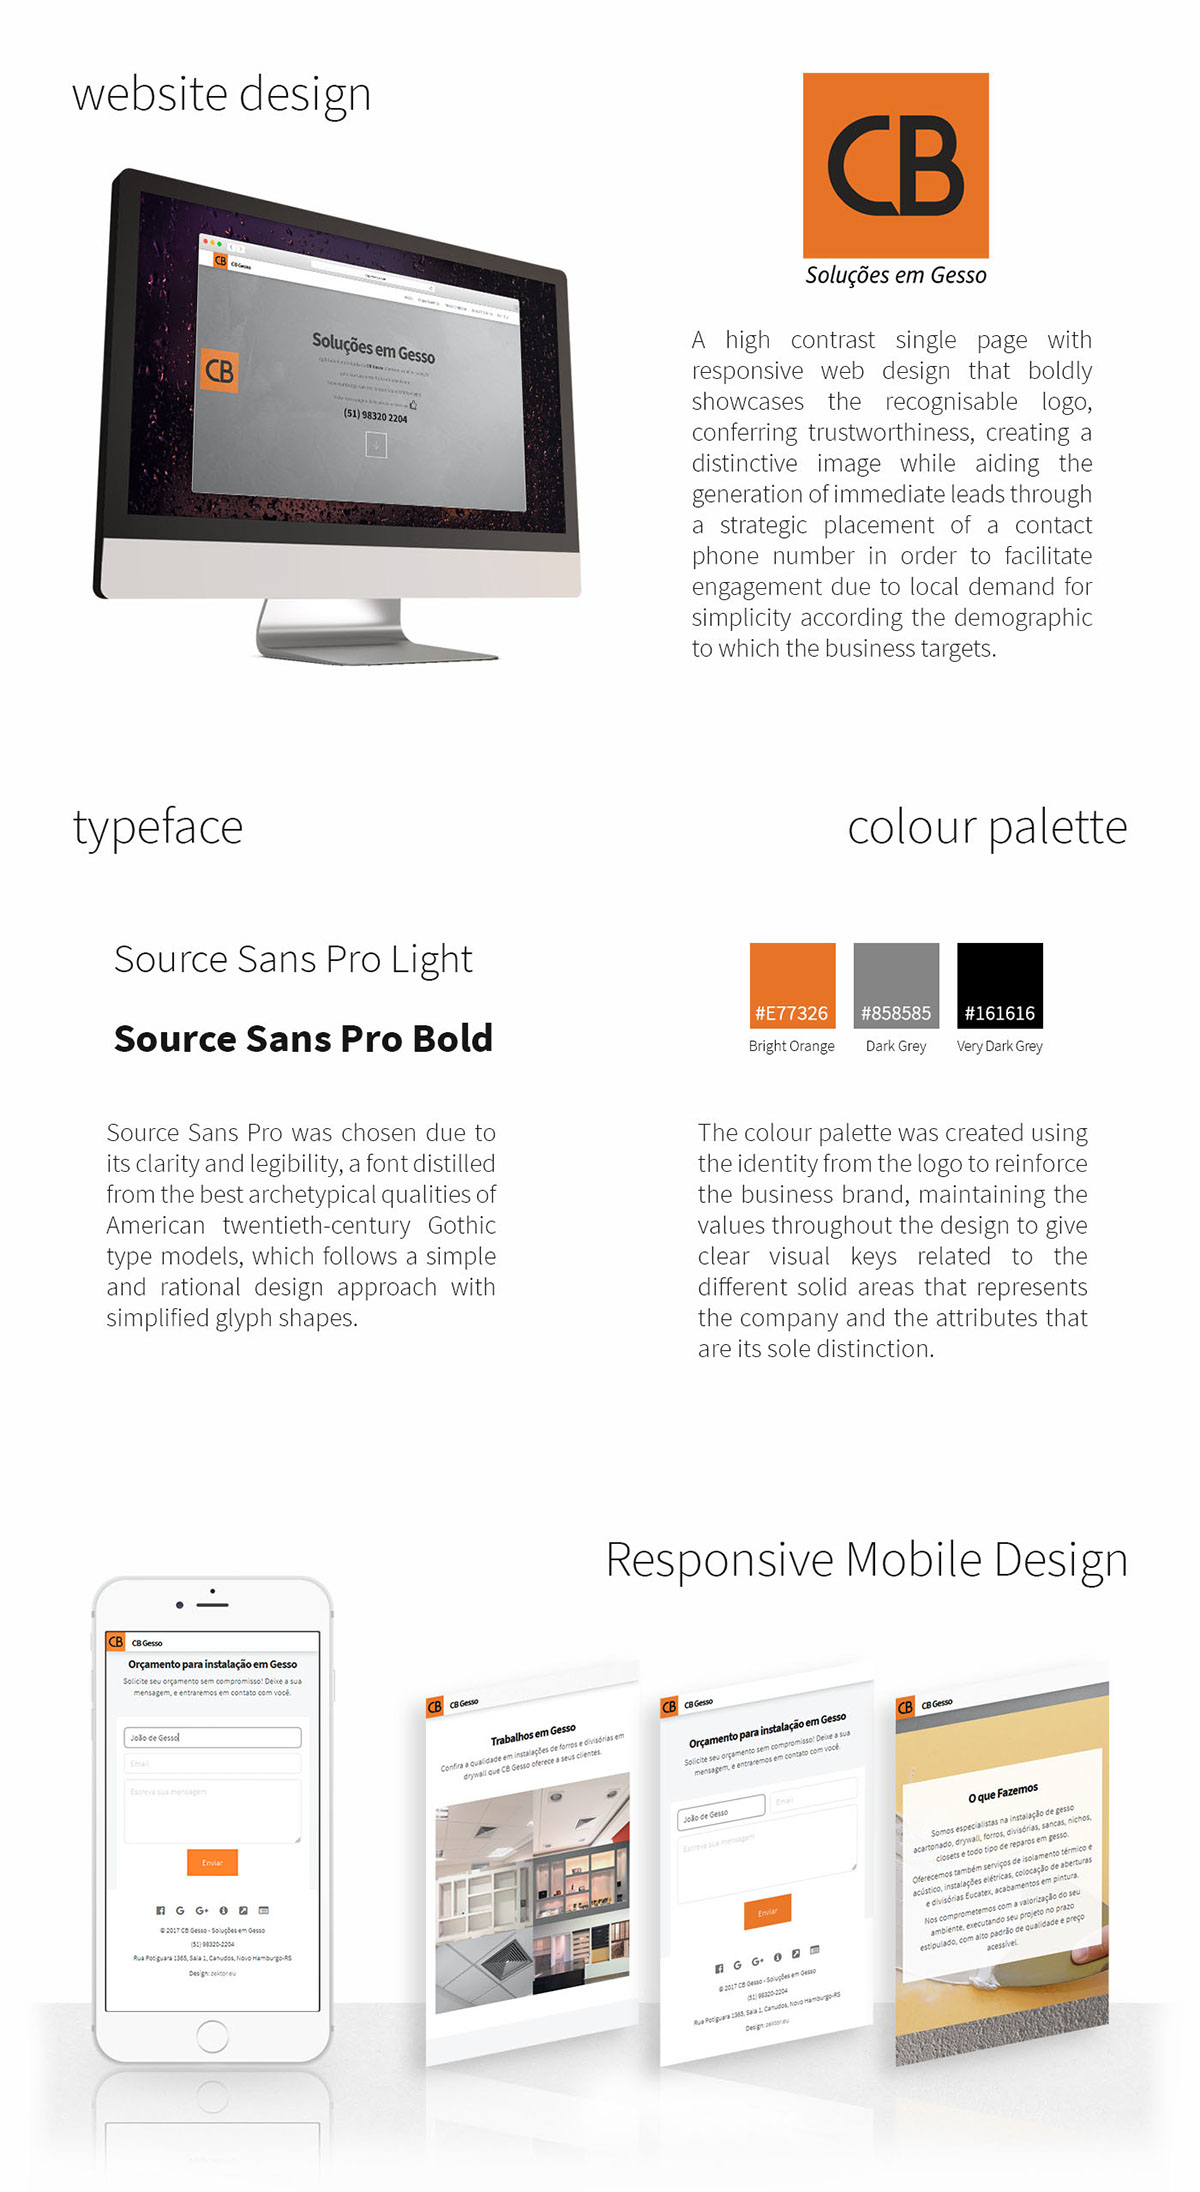 cbgesso gesso plaster Website UI ux Responsive mobile Webdesign design